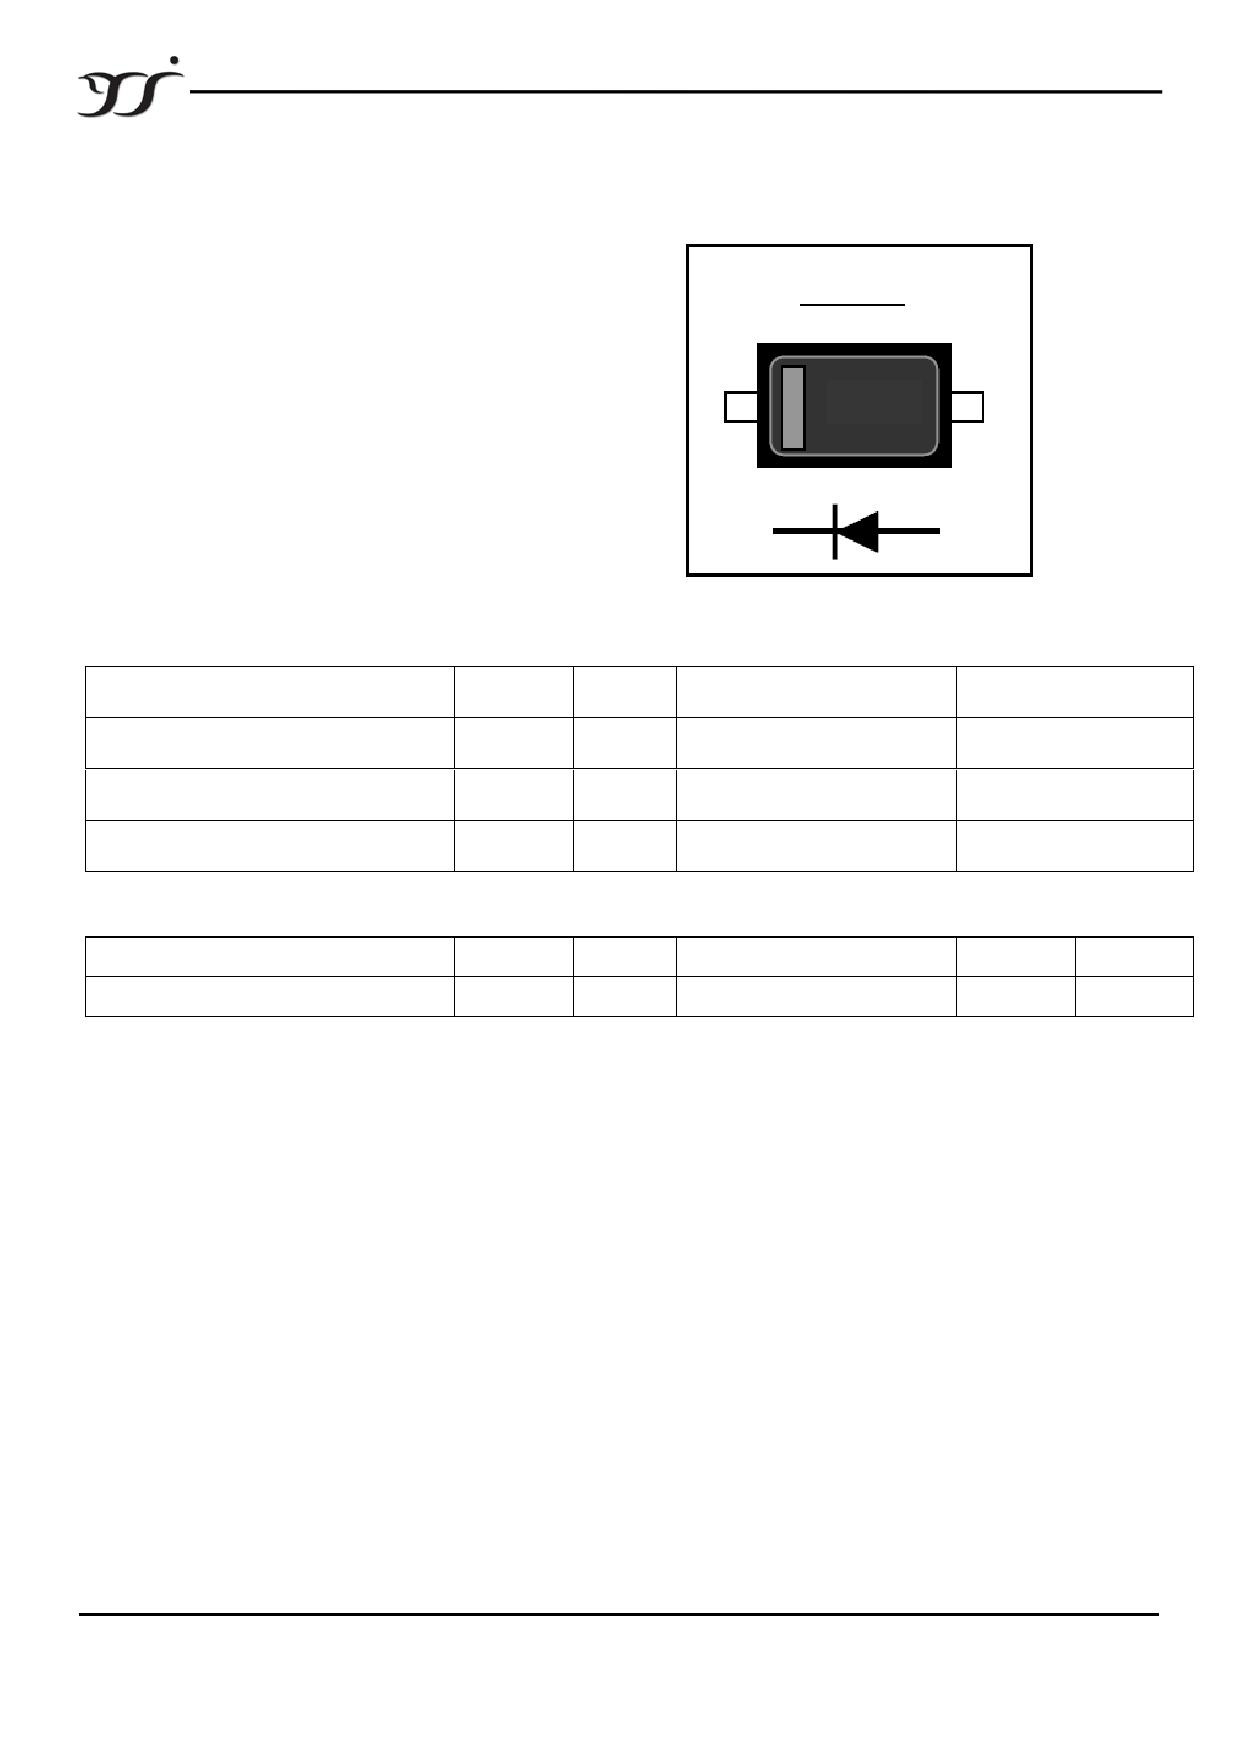 MMSZ5237B Datasheet